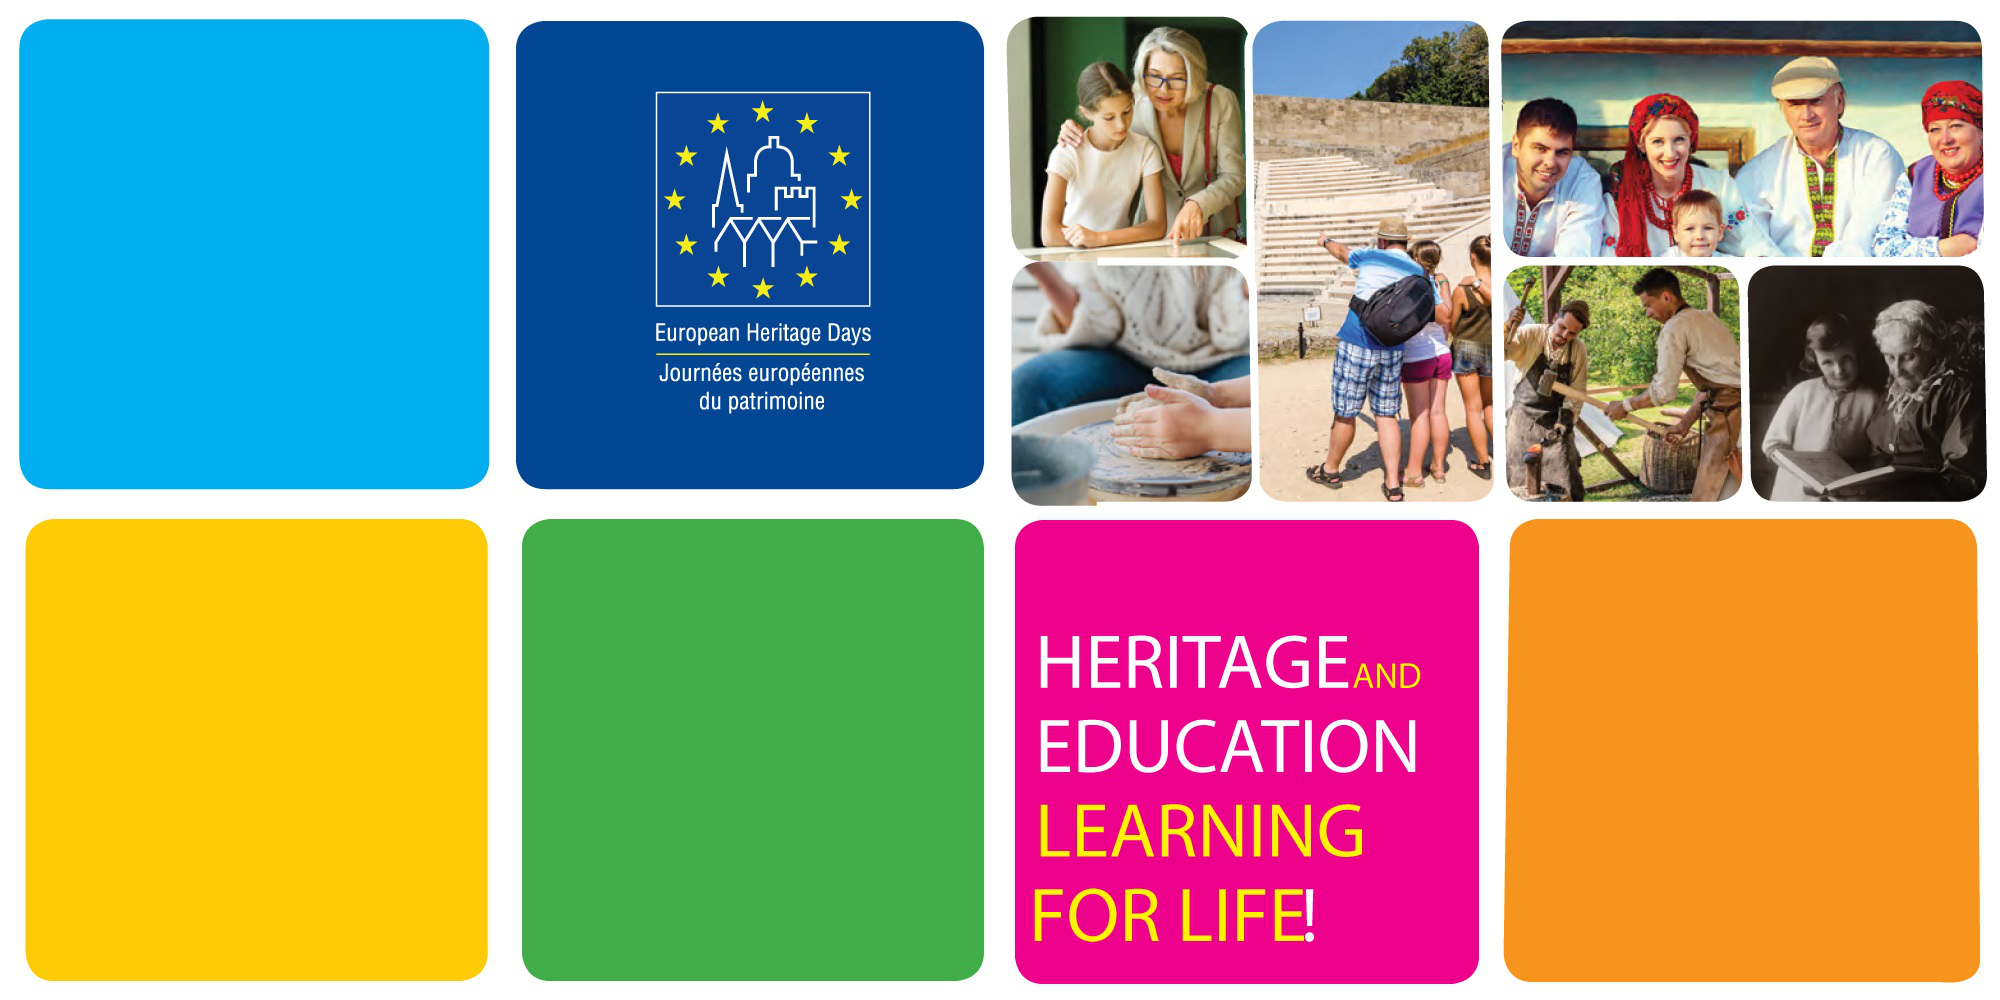 Presentation of CAPuS educational activities at the 2020 European Heritage Days in Croatia